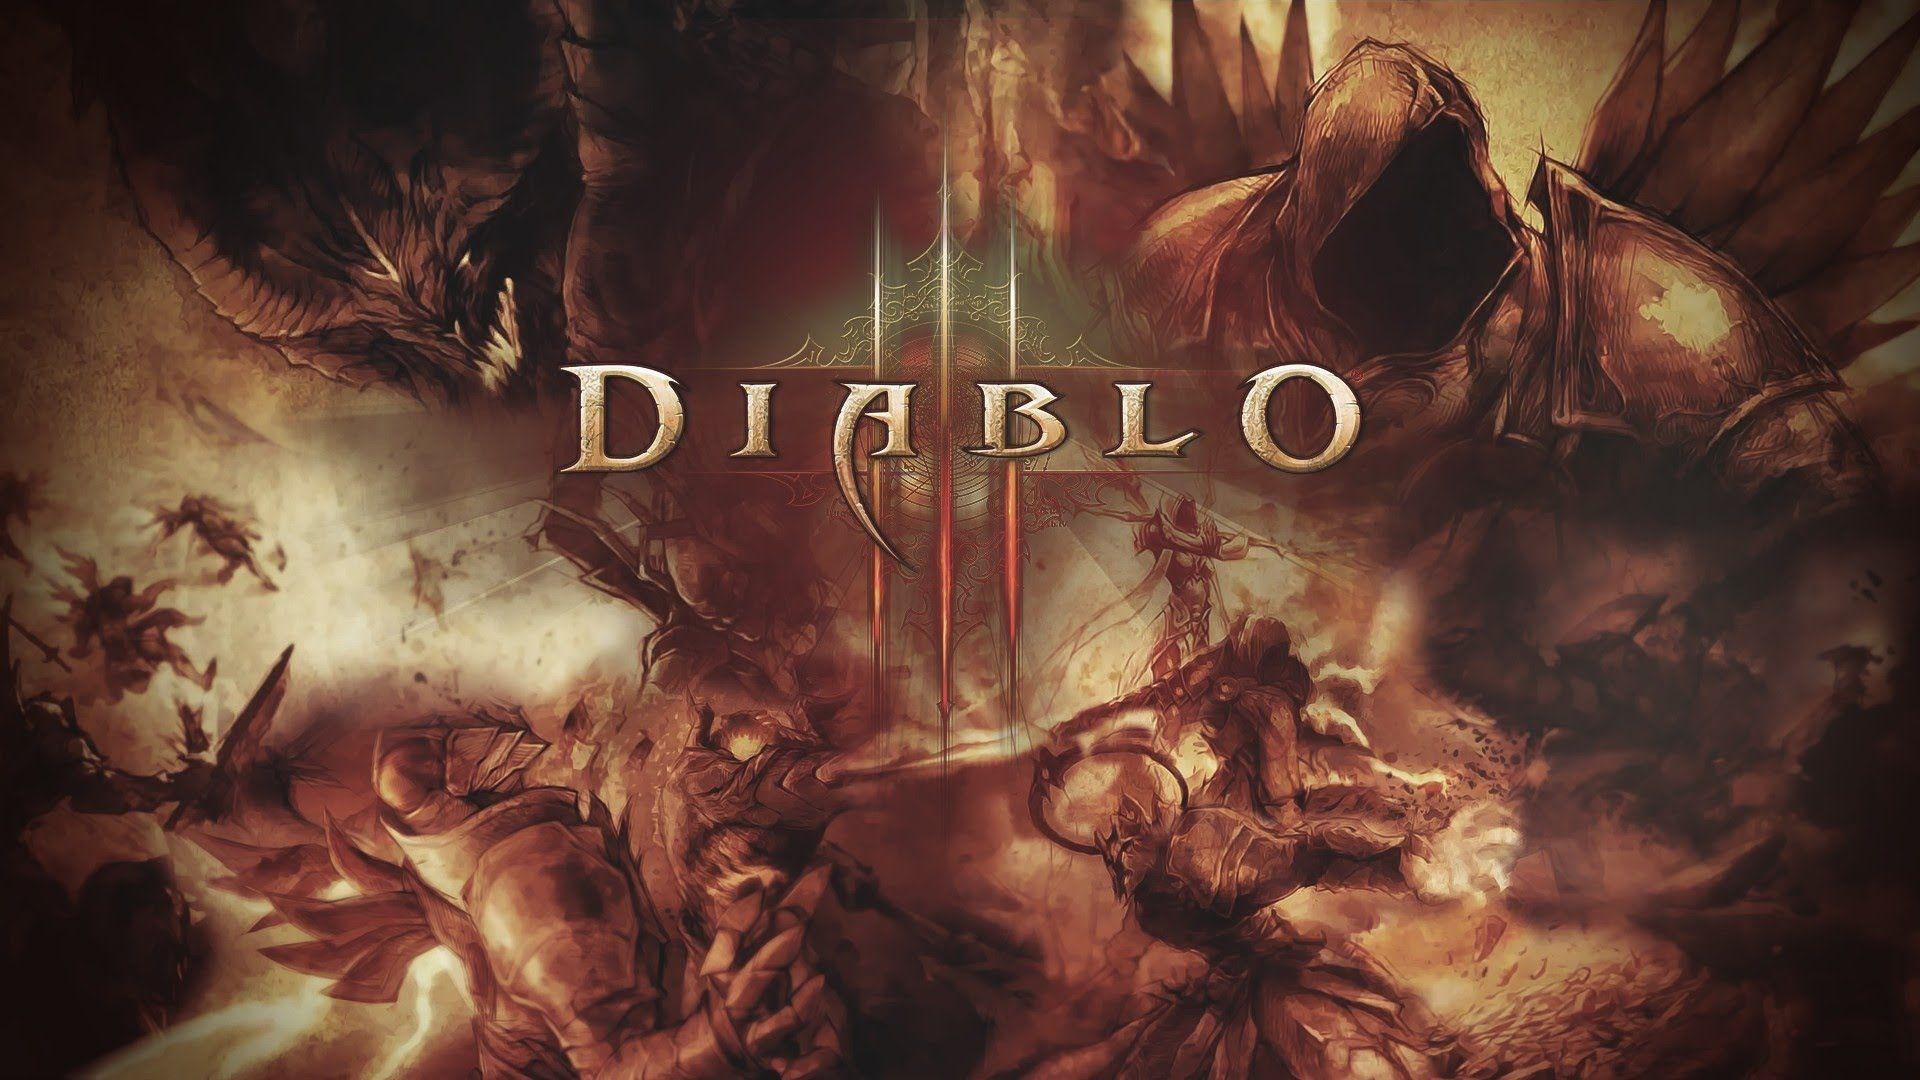 Diablo 3 Reaper Of Souls Game Wallpaper 3449 Frenzia Com Widescreen Wallpaper Fantasy Pictures Overwatch Wallpapers